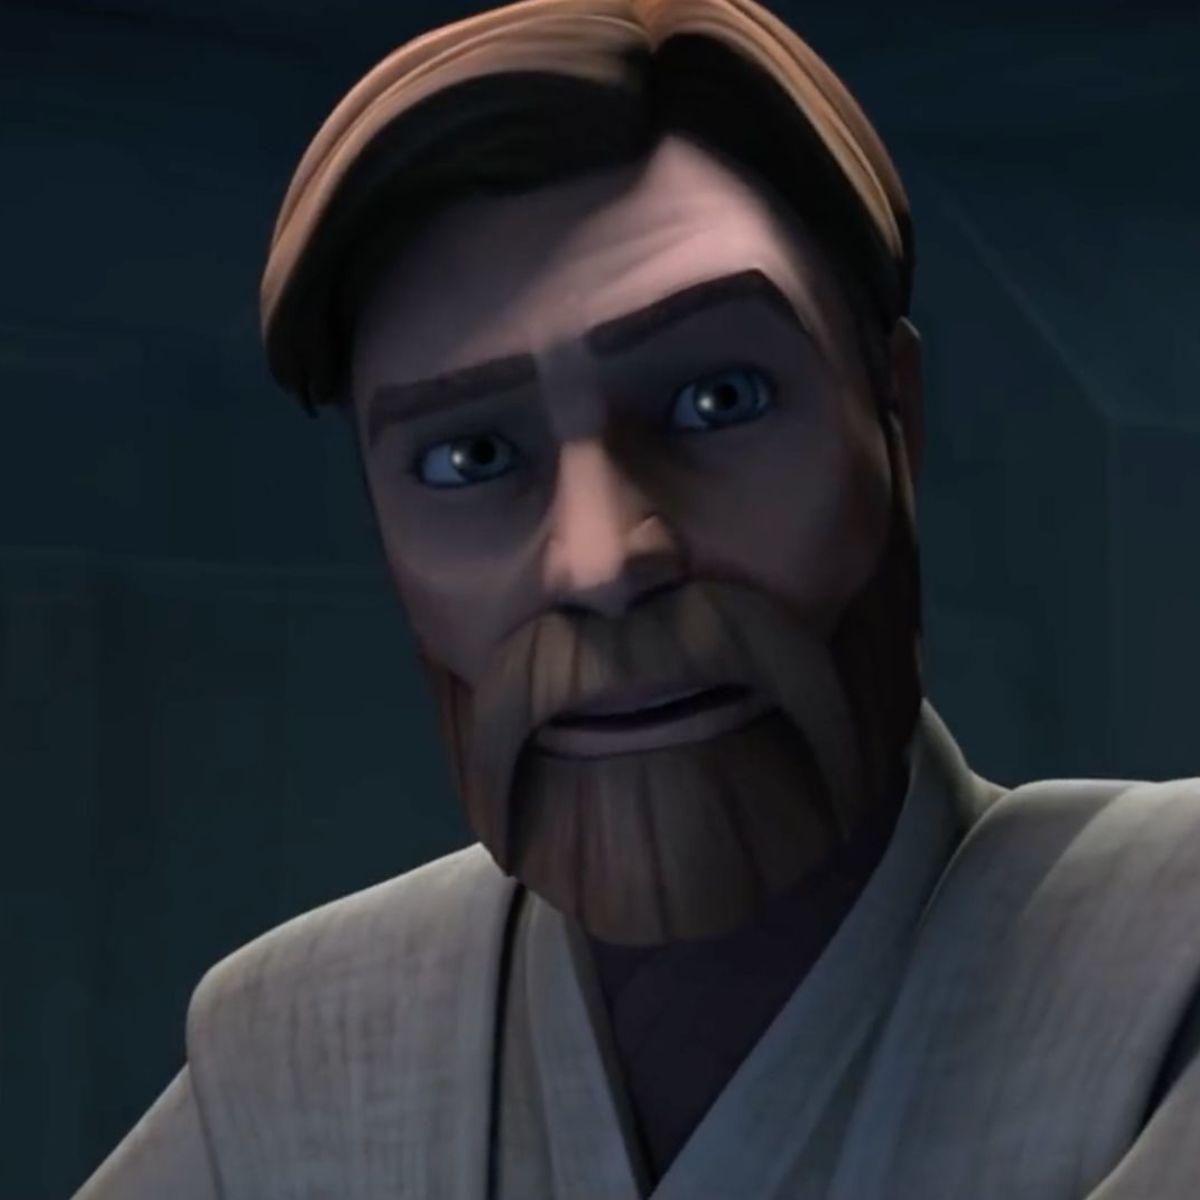 Obi-Wan Kenobi (James Arnold Taylor) on Star Wars: The Clone Wars